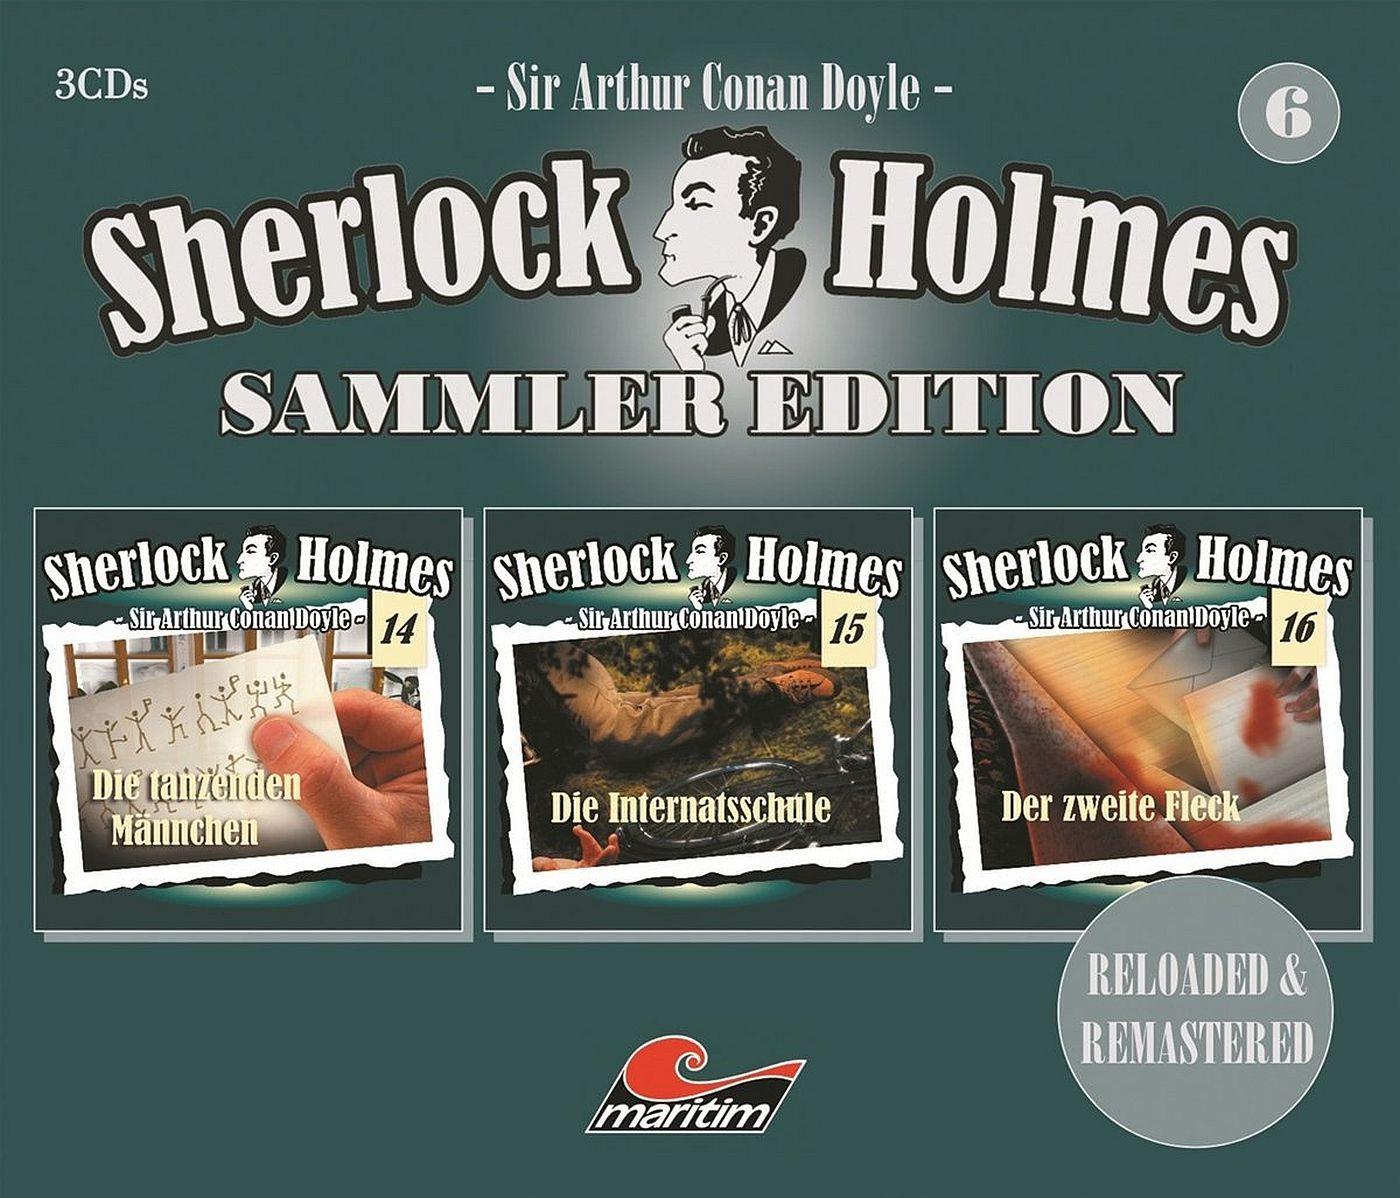 Sherlock Holmes - Sammler Edition - Box 6 (Folge 14, 15, 16)